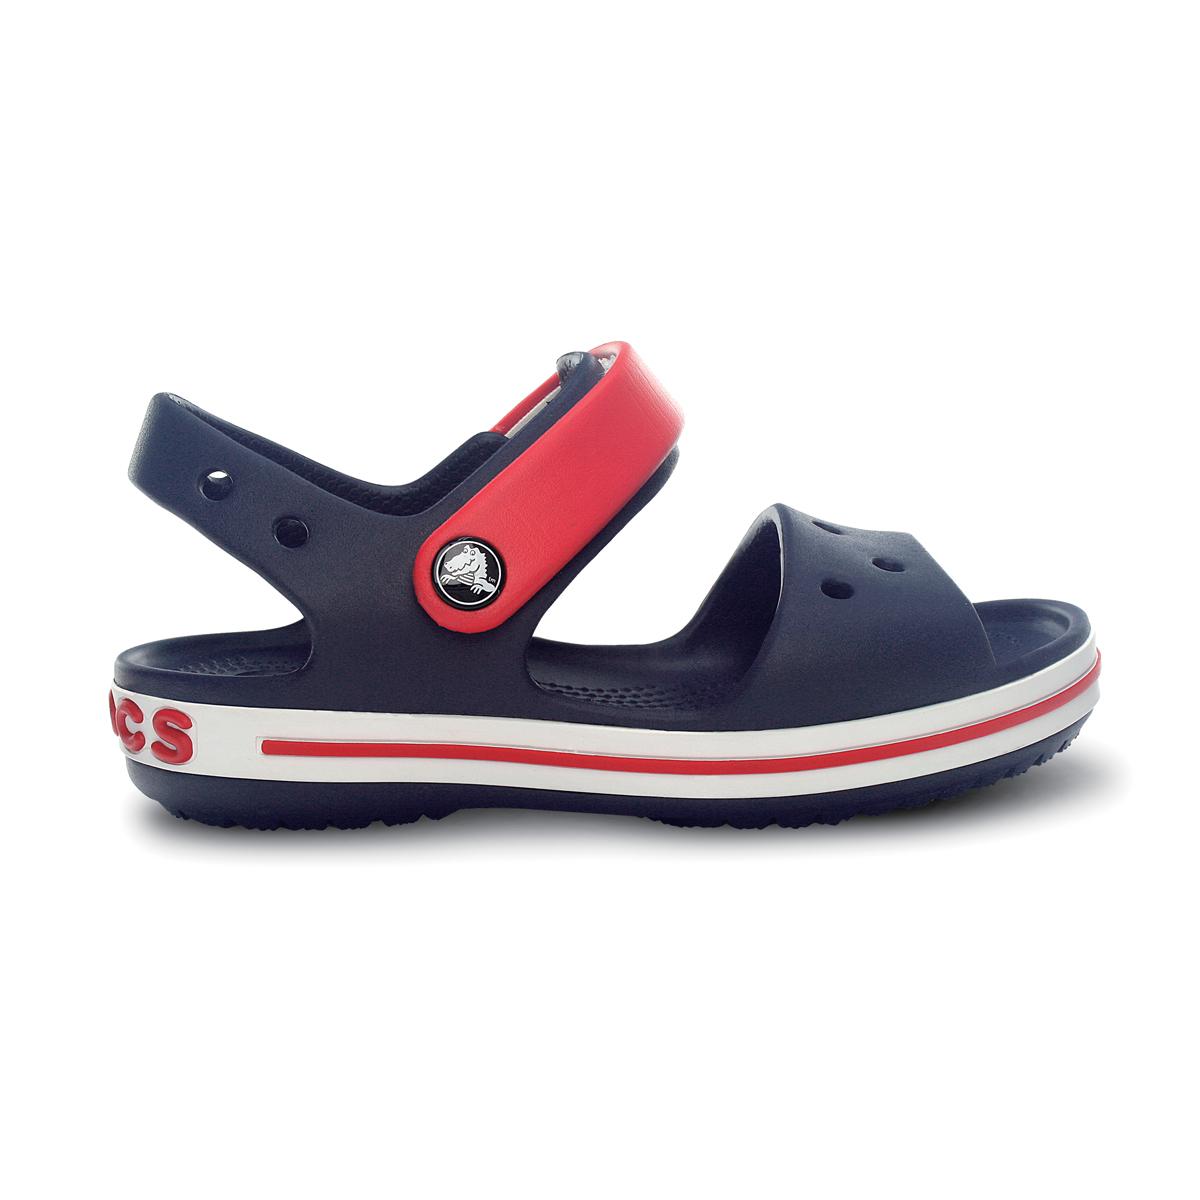 Crocs Crocband Sandal Kids - Lacivert/Kırmızı